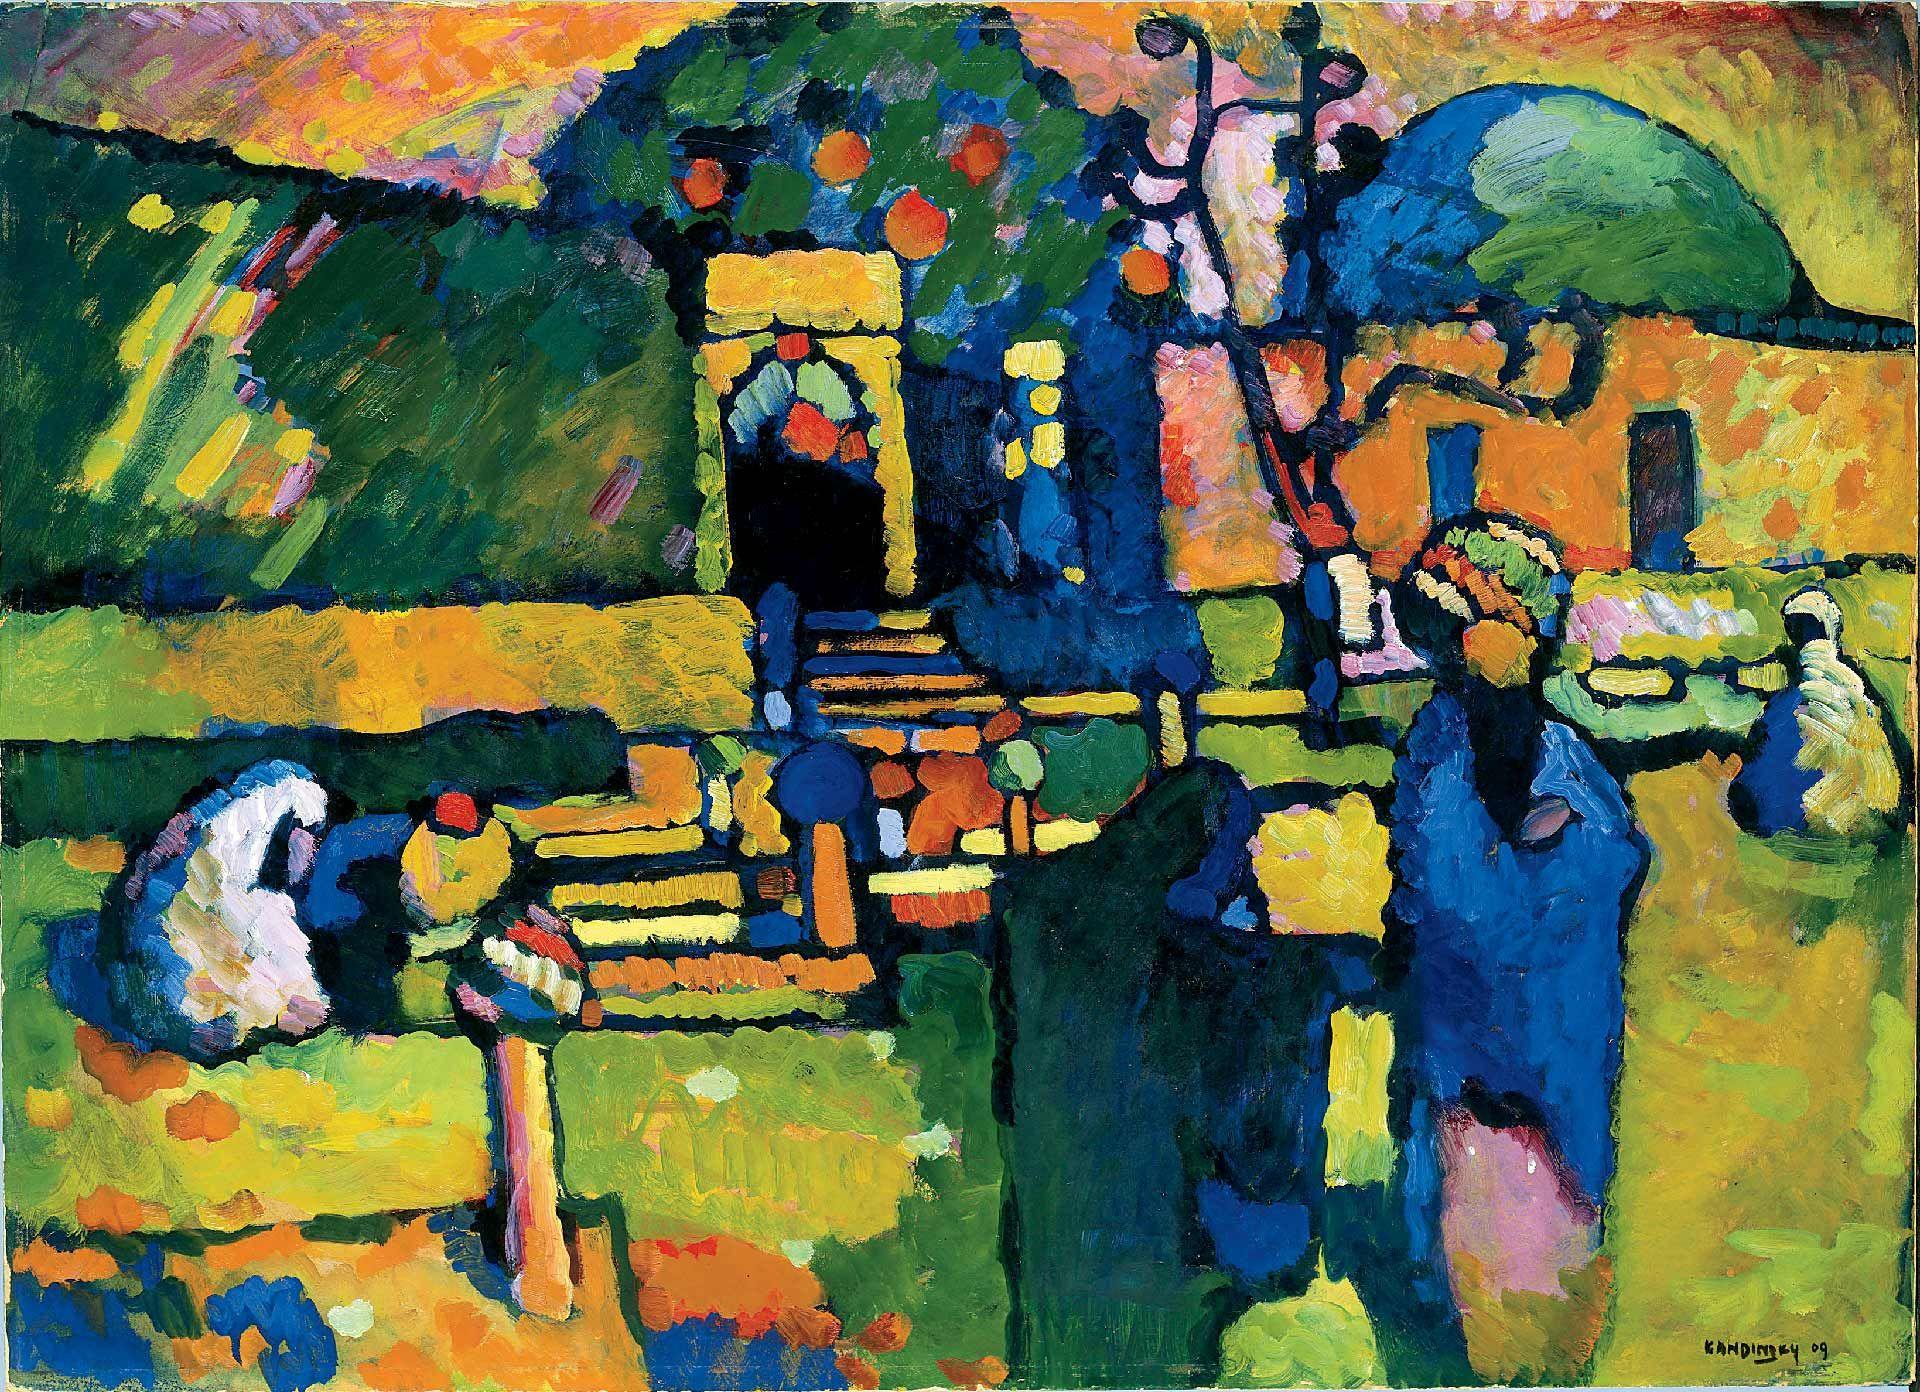 Wassily Kandinsky, Arabian Cemetery (detail), 1909, oil on cardboard. Hamburger Kunsthalle